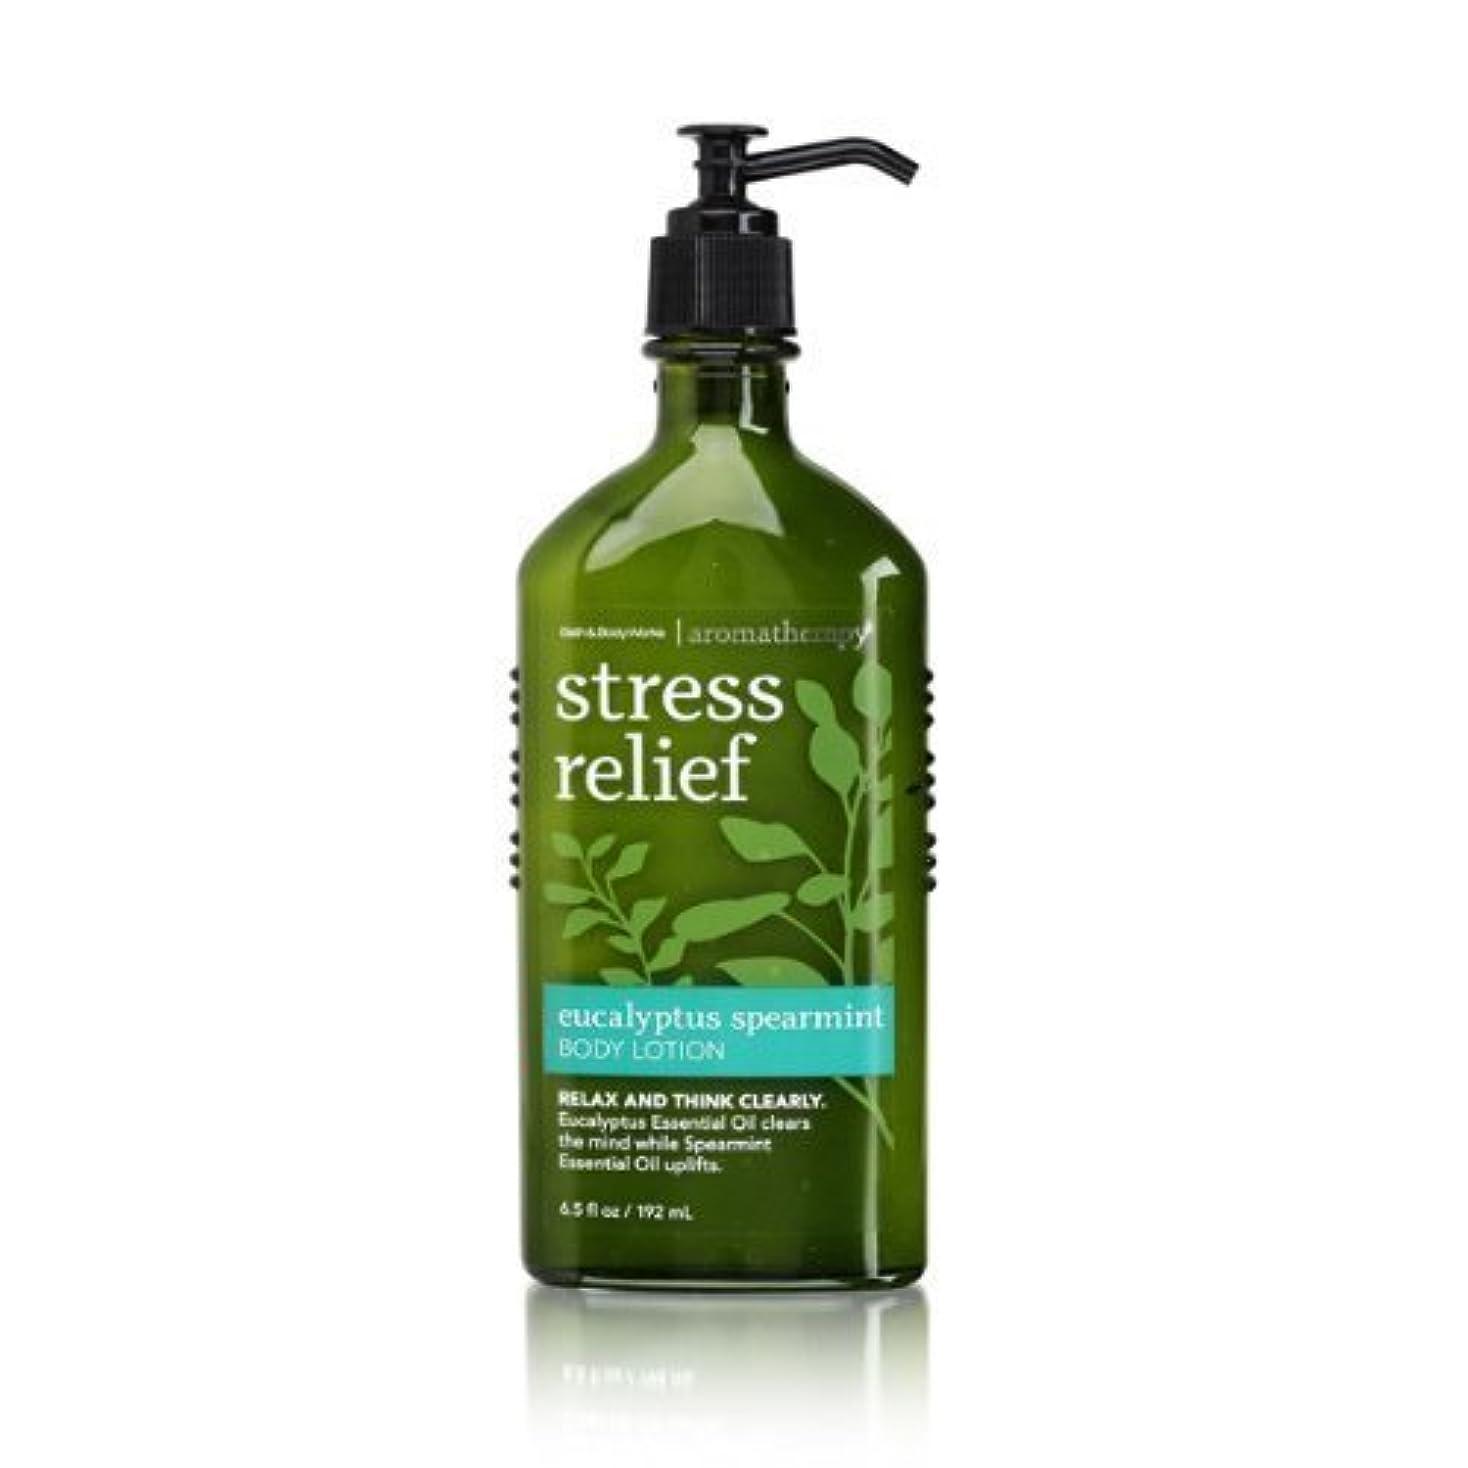 活発母飛行場Bath & Body Works Aromatherapy Body Lotion with Free Hand Sanitizer (Eucalyptus Spearmint) [並行輸入品]